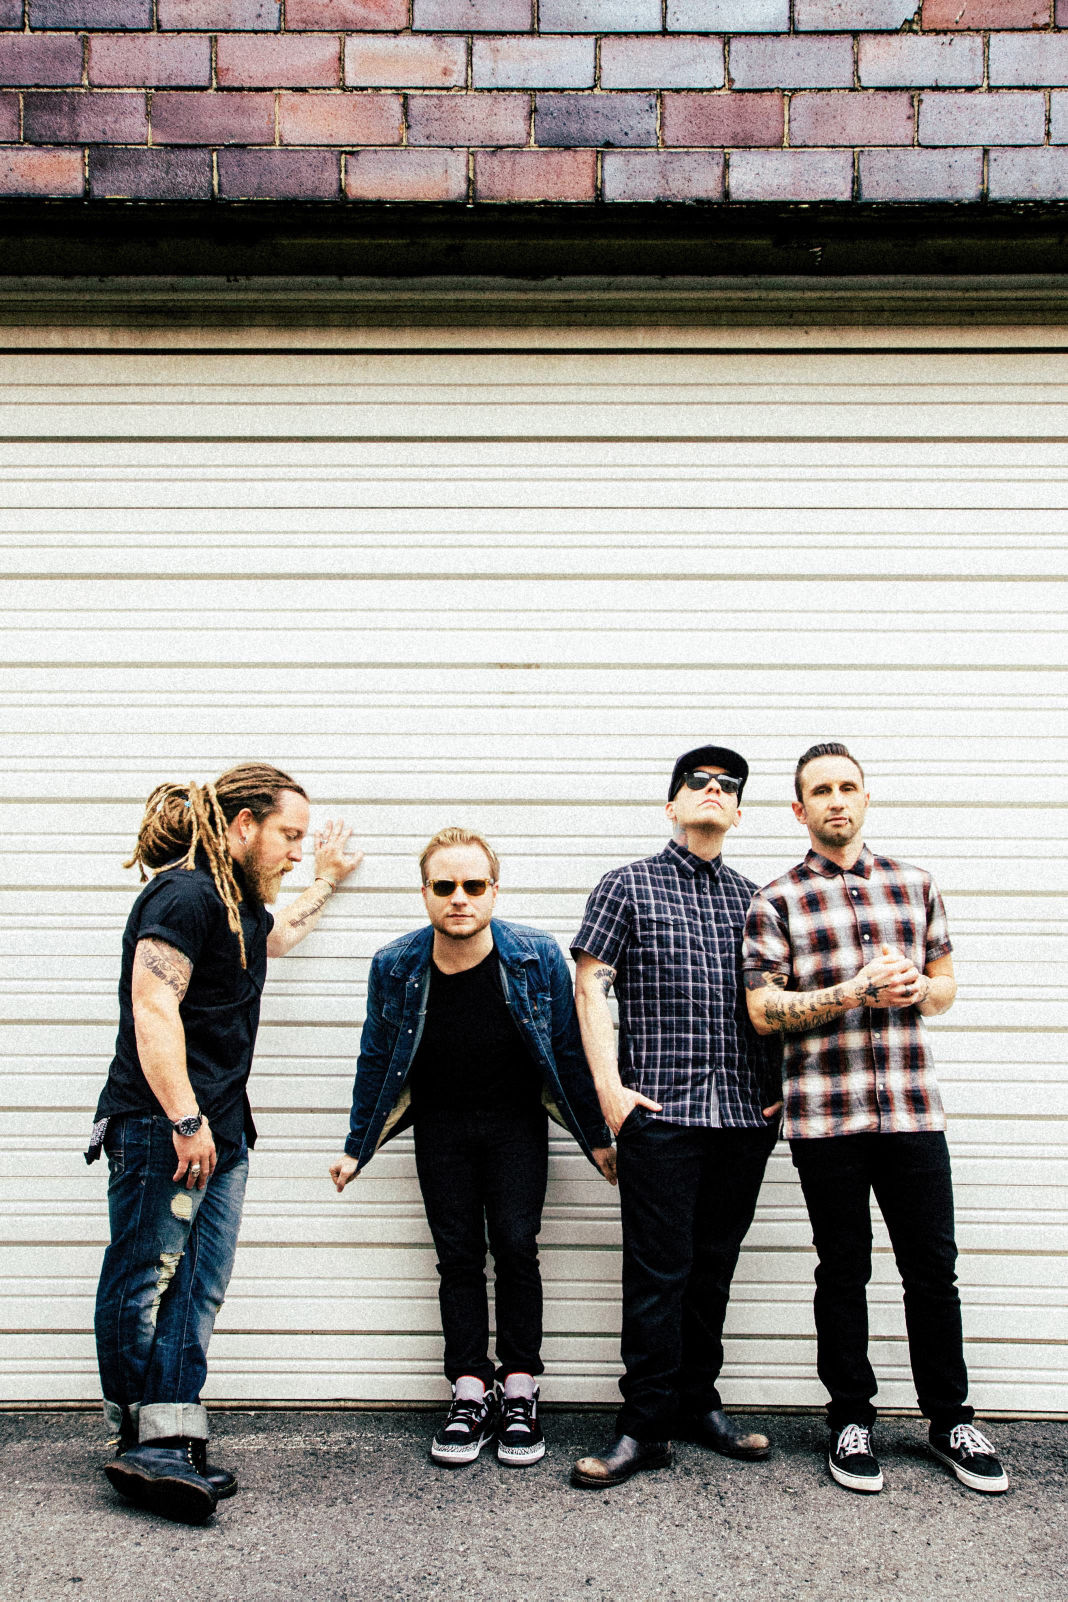 Shinedown Breaking Benjamin Sevendust Bring Hard Rock To Arena